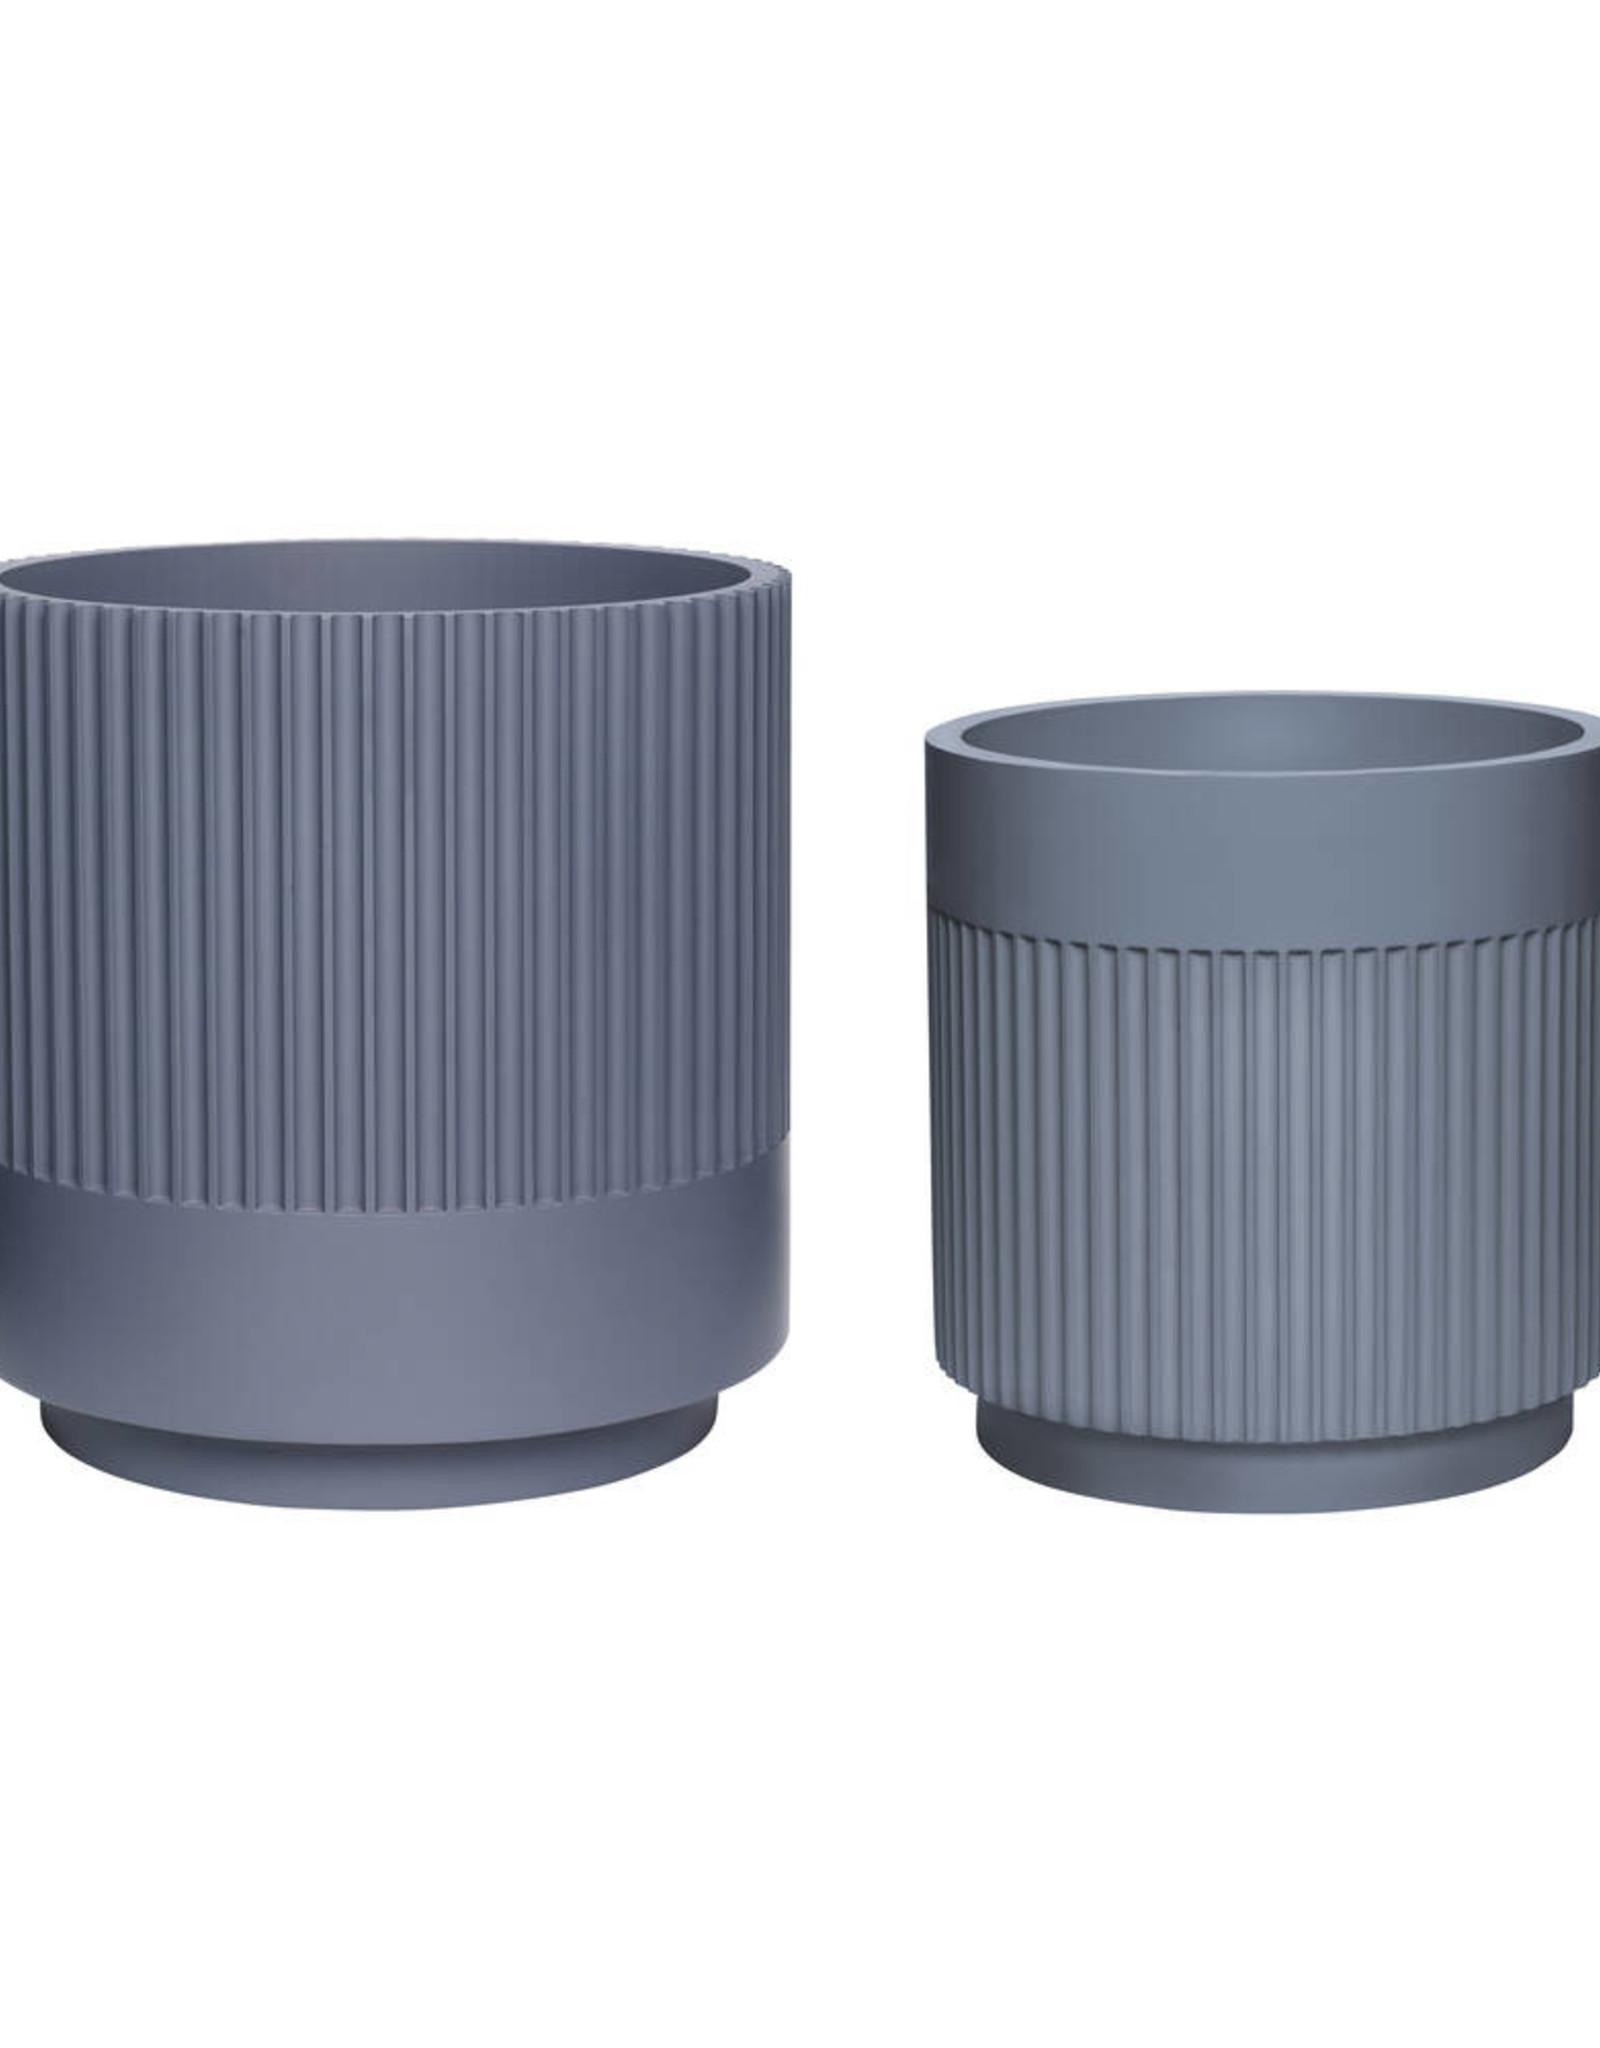 Hübsch Plaster Pot - Dark Grey ø30xh31